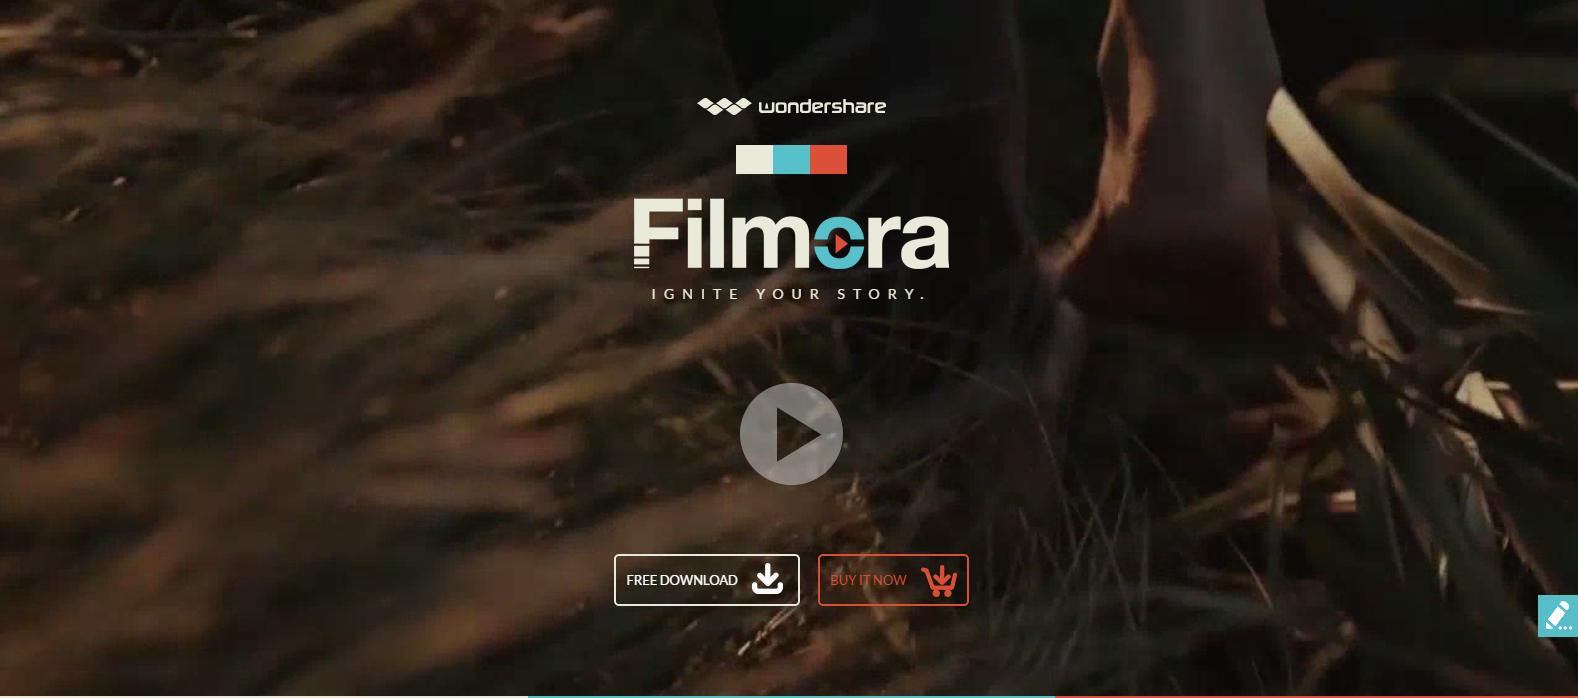 Wondershare Filmora 8.7.5